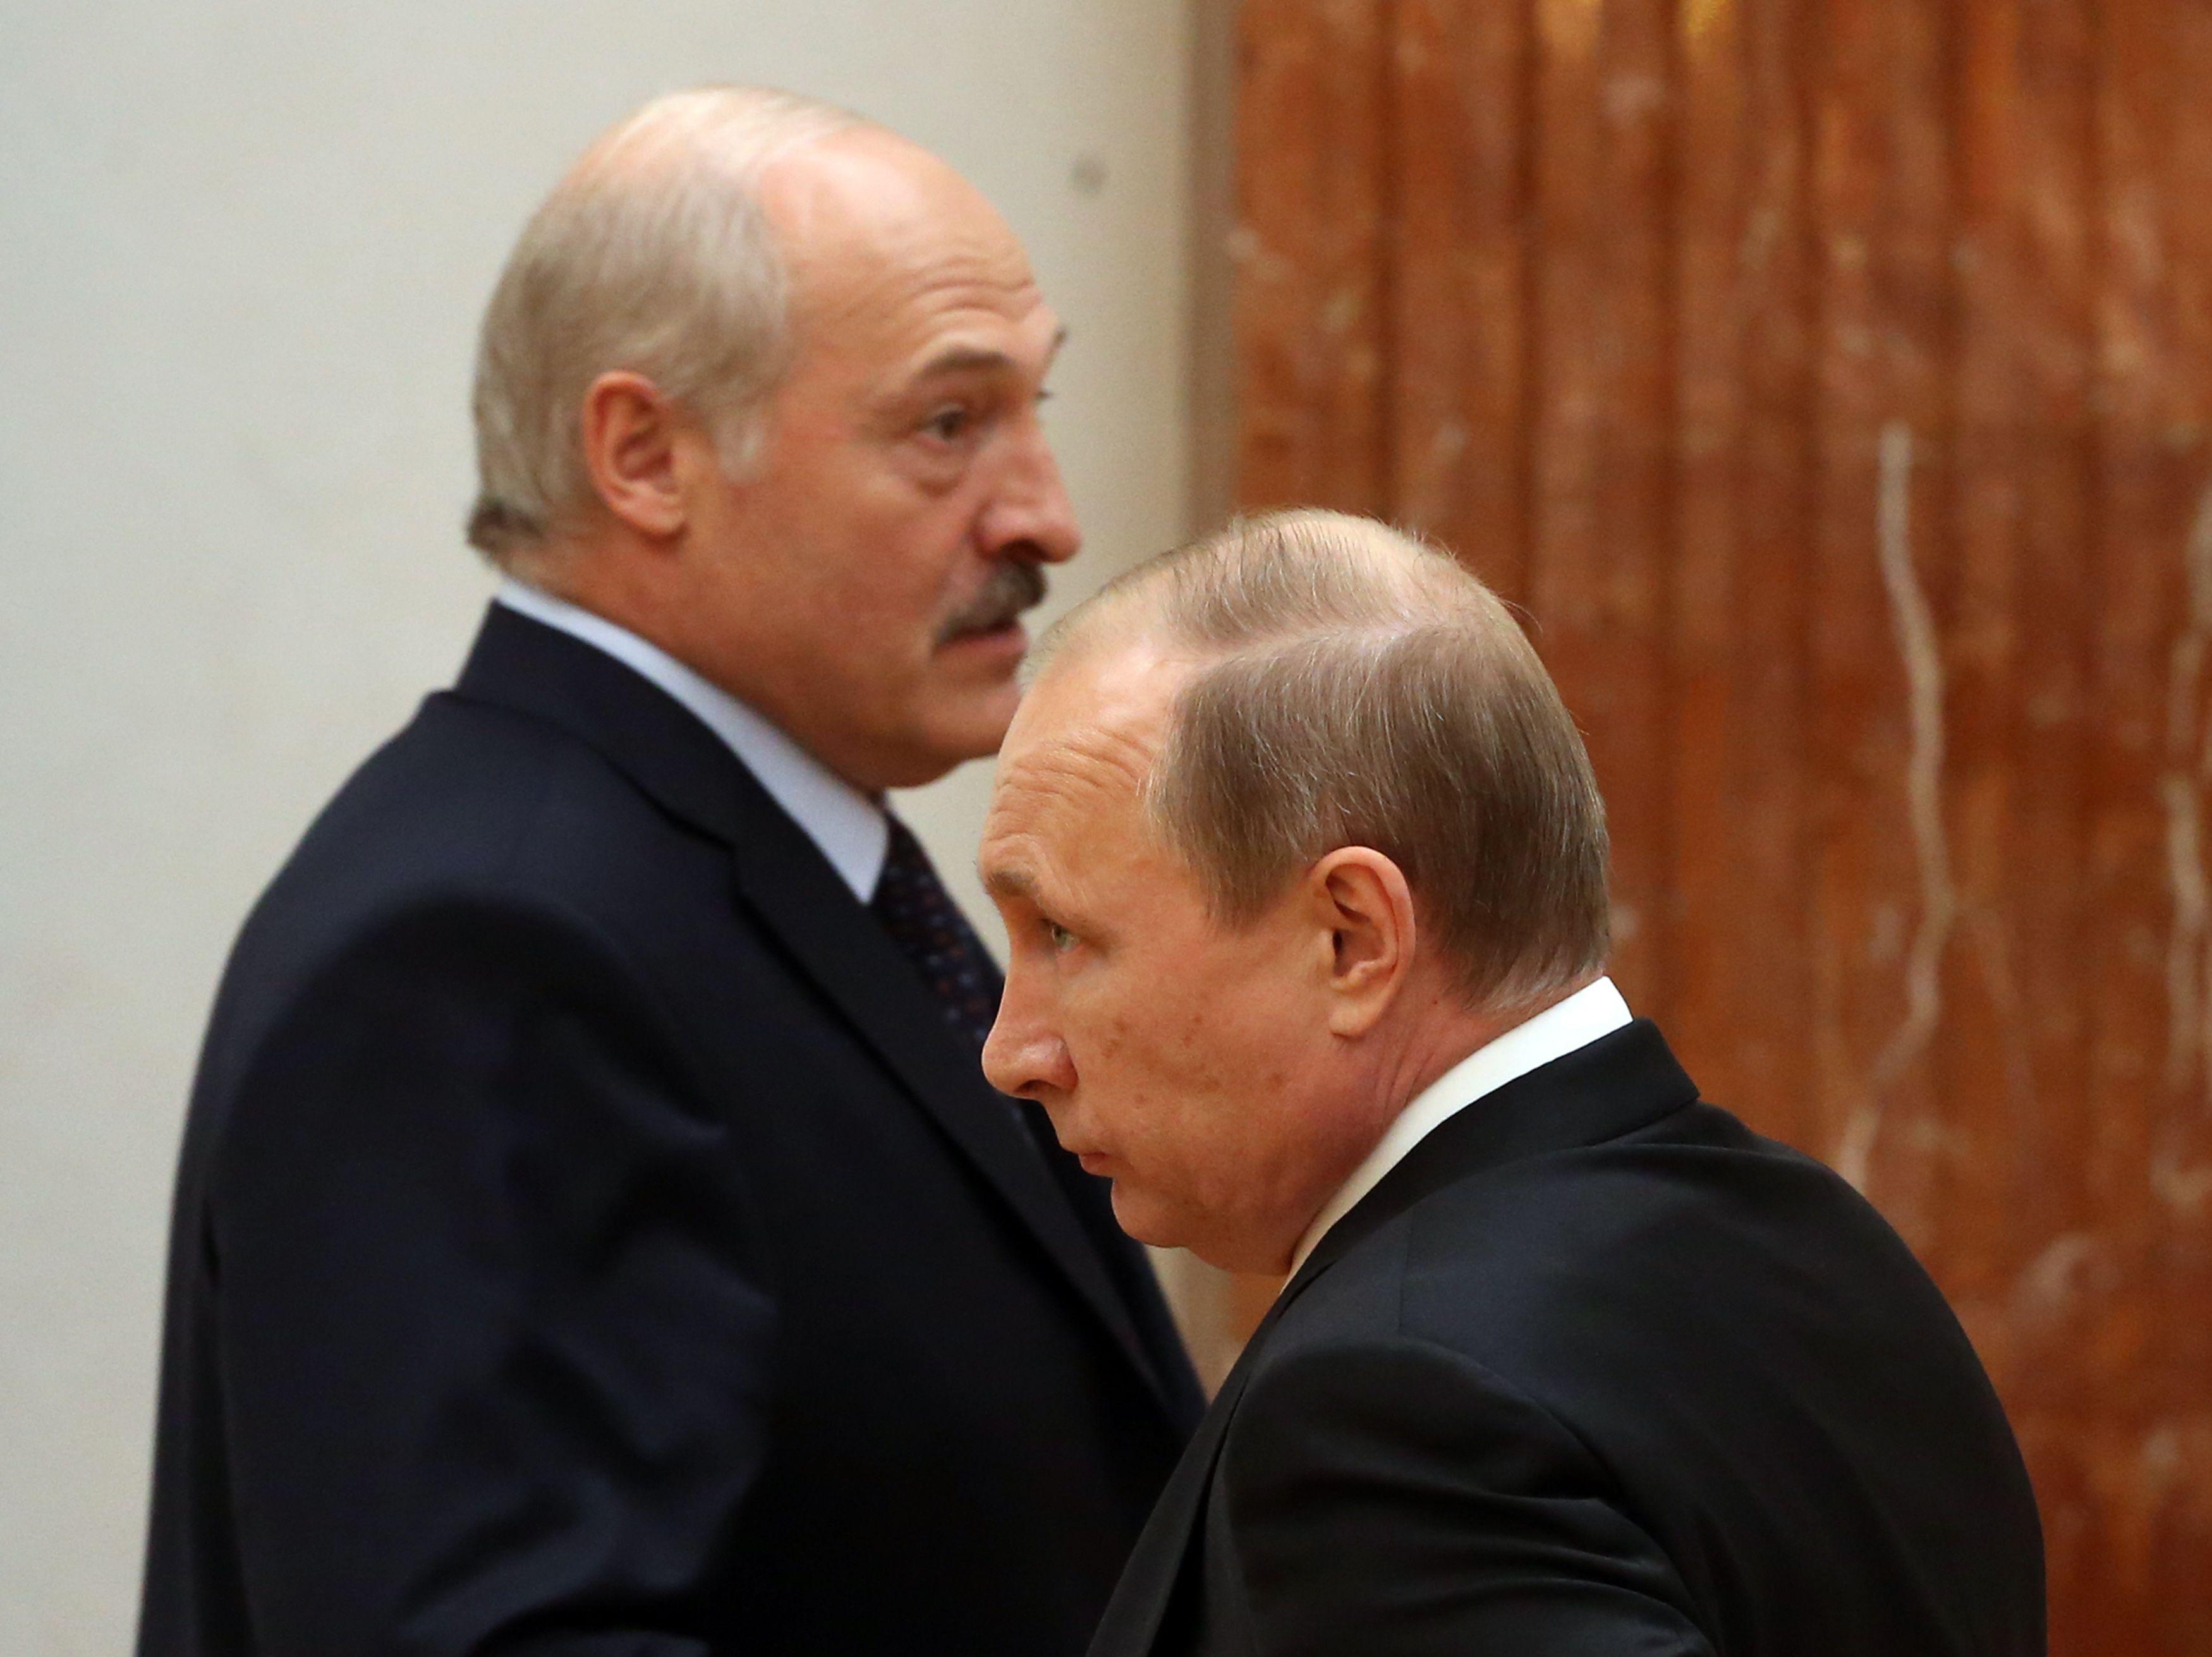 Matrimonio In Russia : Matrimonio russia matrimonio